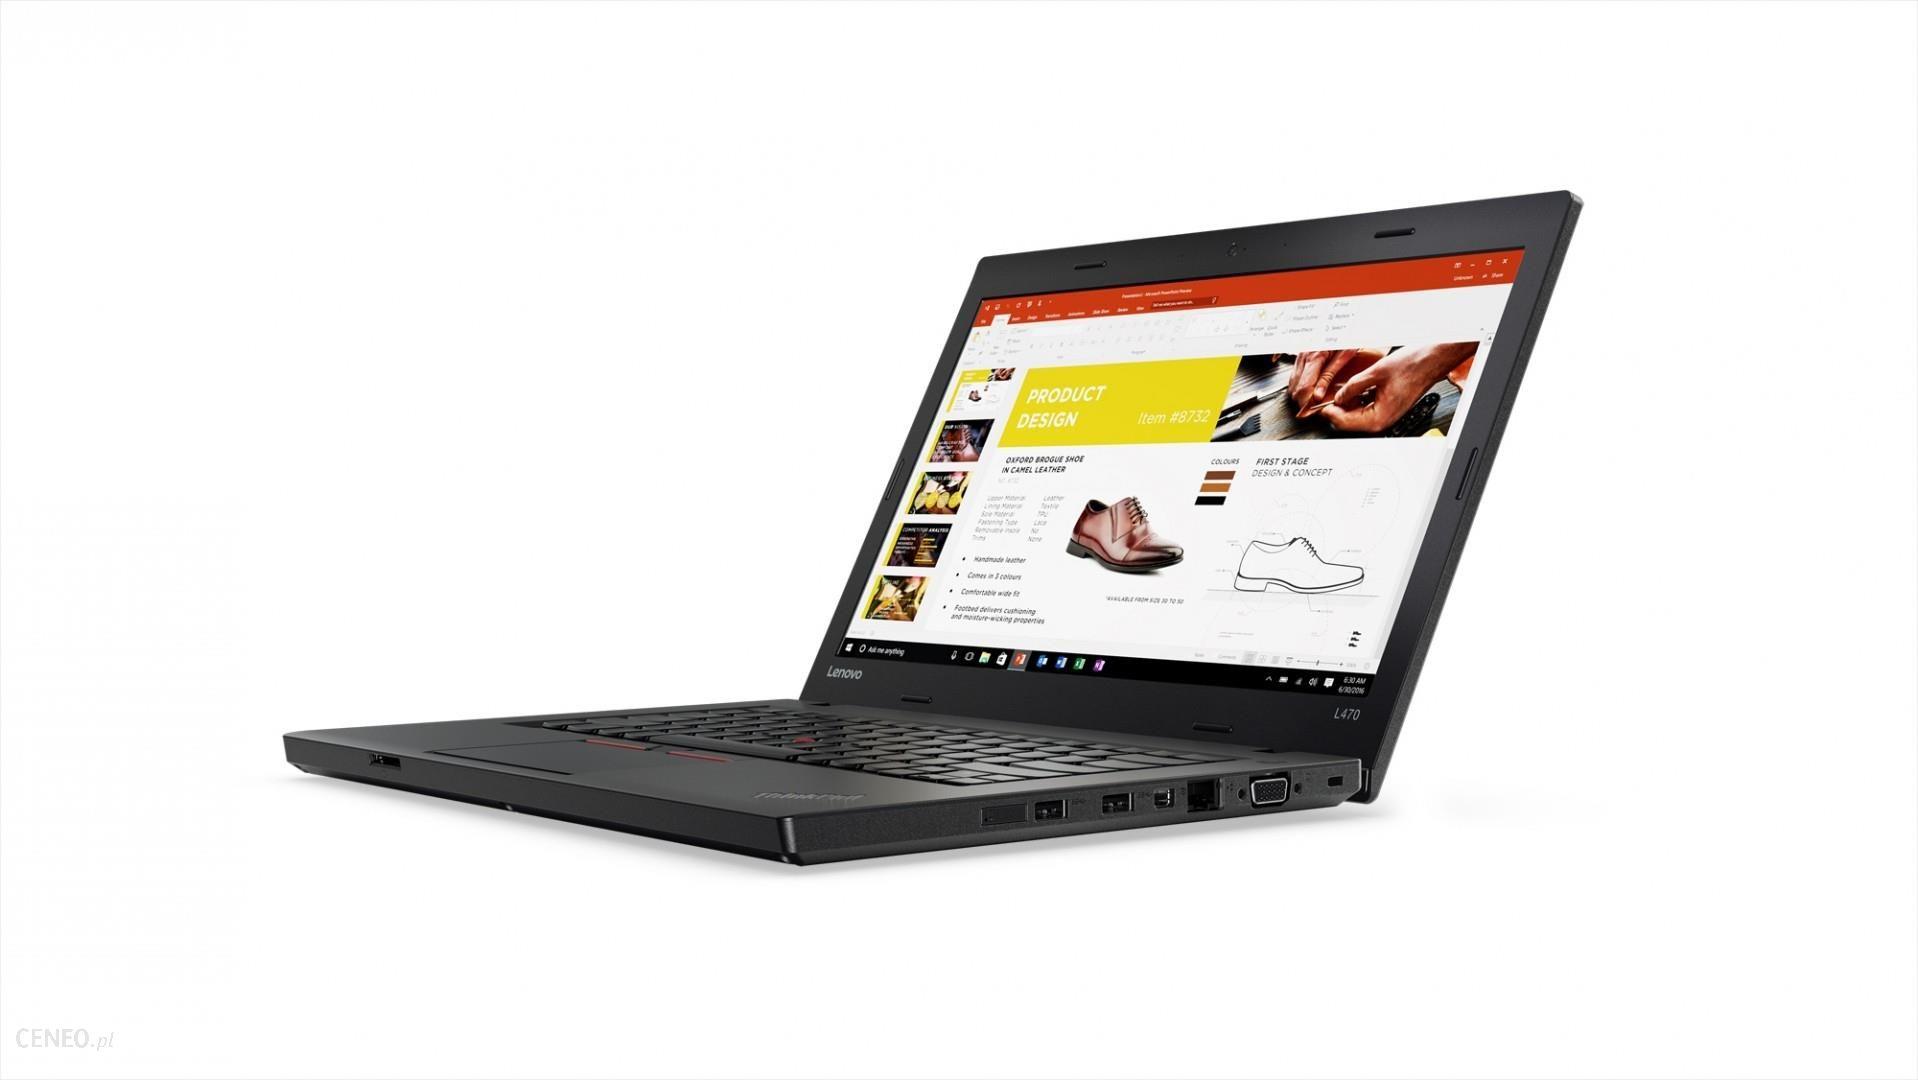 Laptop Lenovo ThinkPad L470 20J4000VPB zdjęcie 1